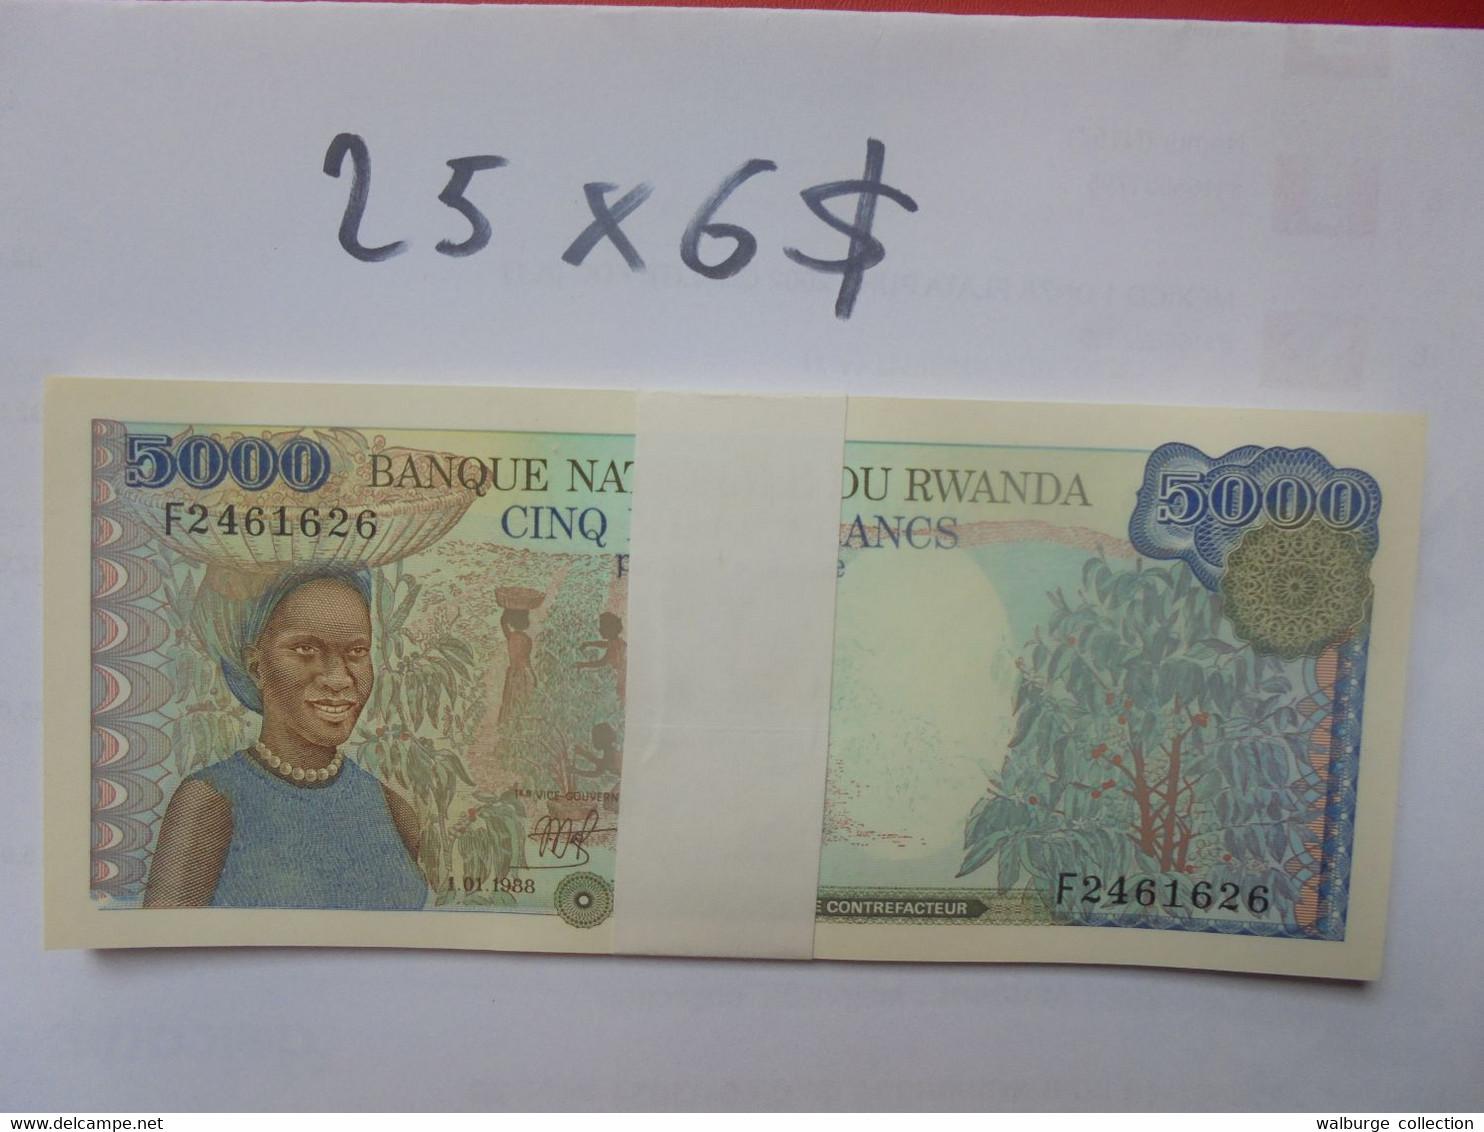 RWANDA LIASSE 5000 FRANCS 1988 25 BILLETS NEUFS NUMEROS SE SUIVANT COTE:150$ !!! - Rwanda